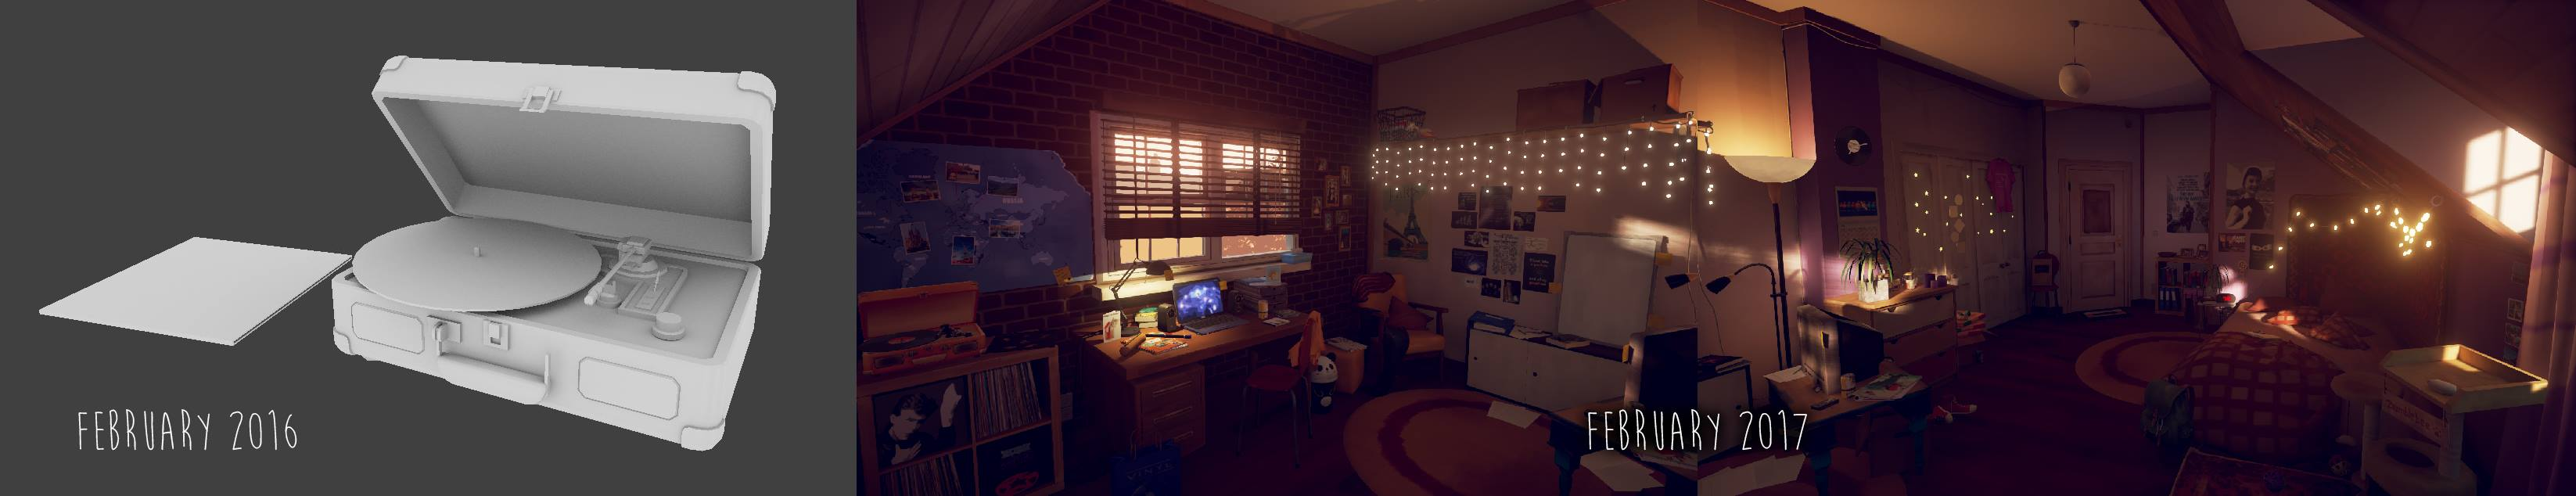 Marie's Room history